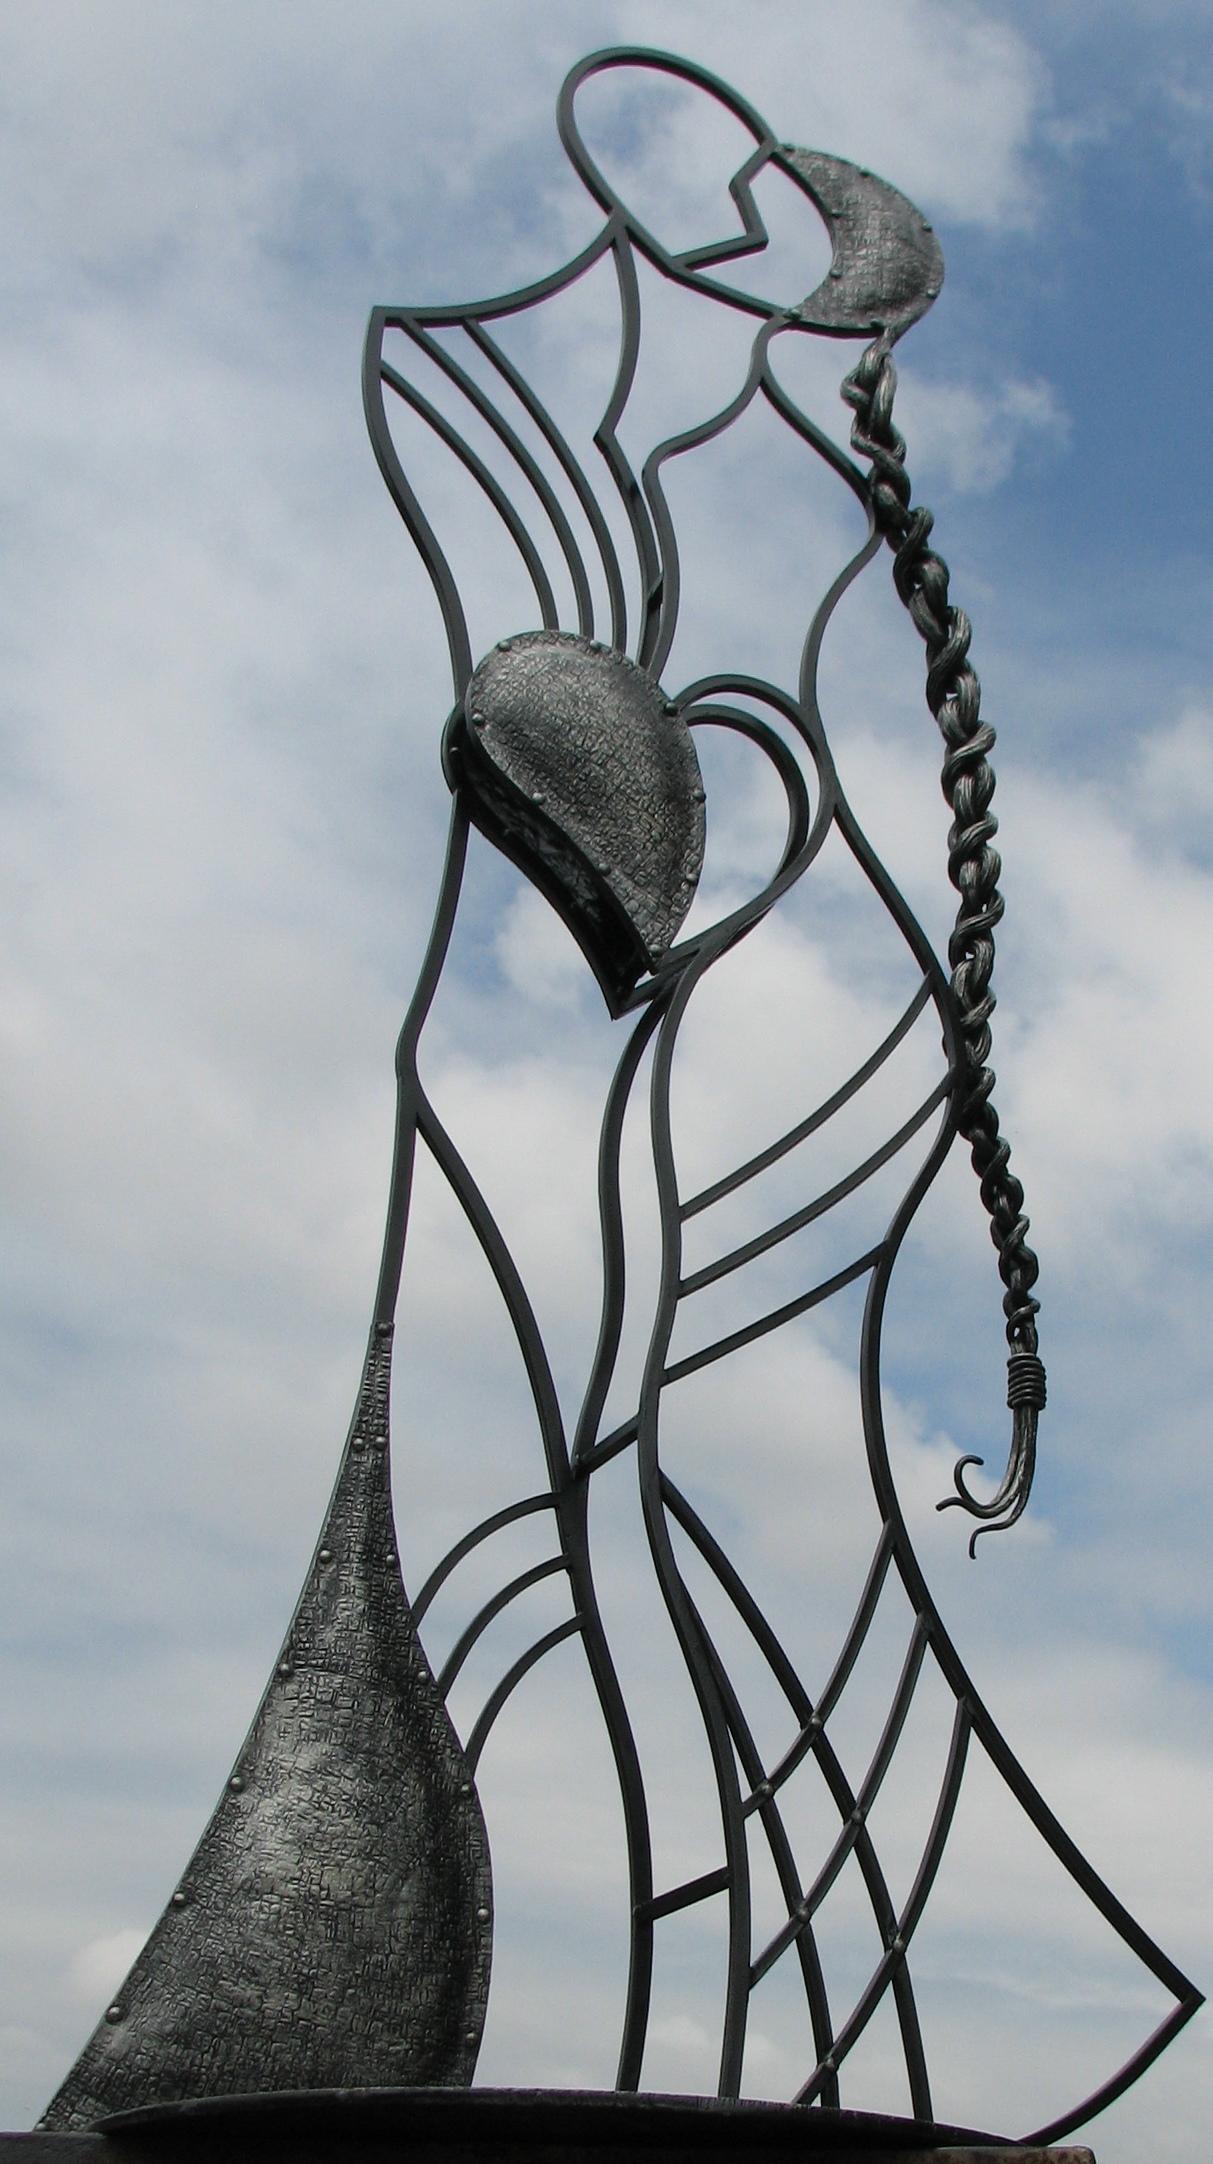 кованая скульптура, ковка Владивосток